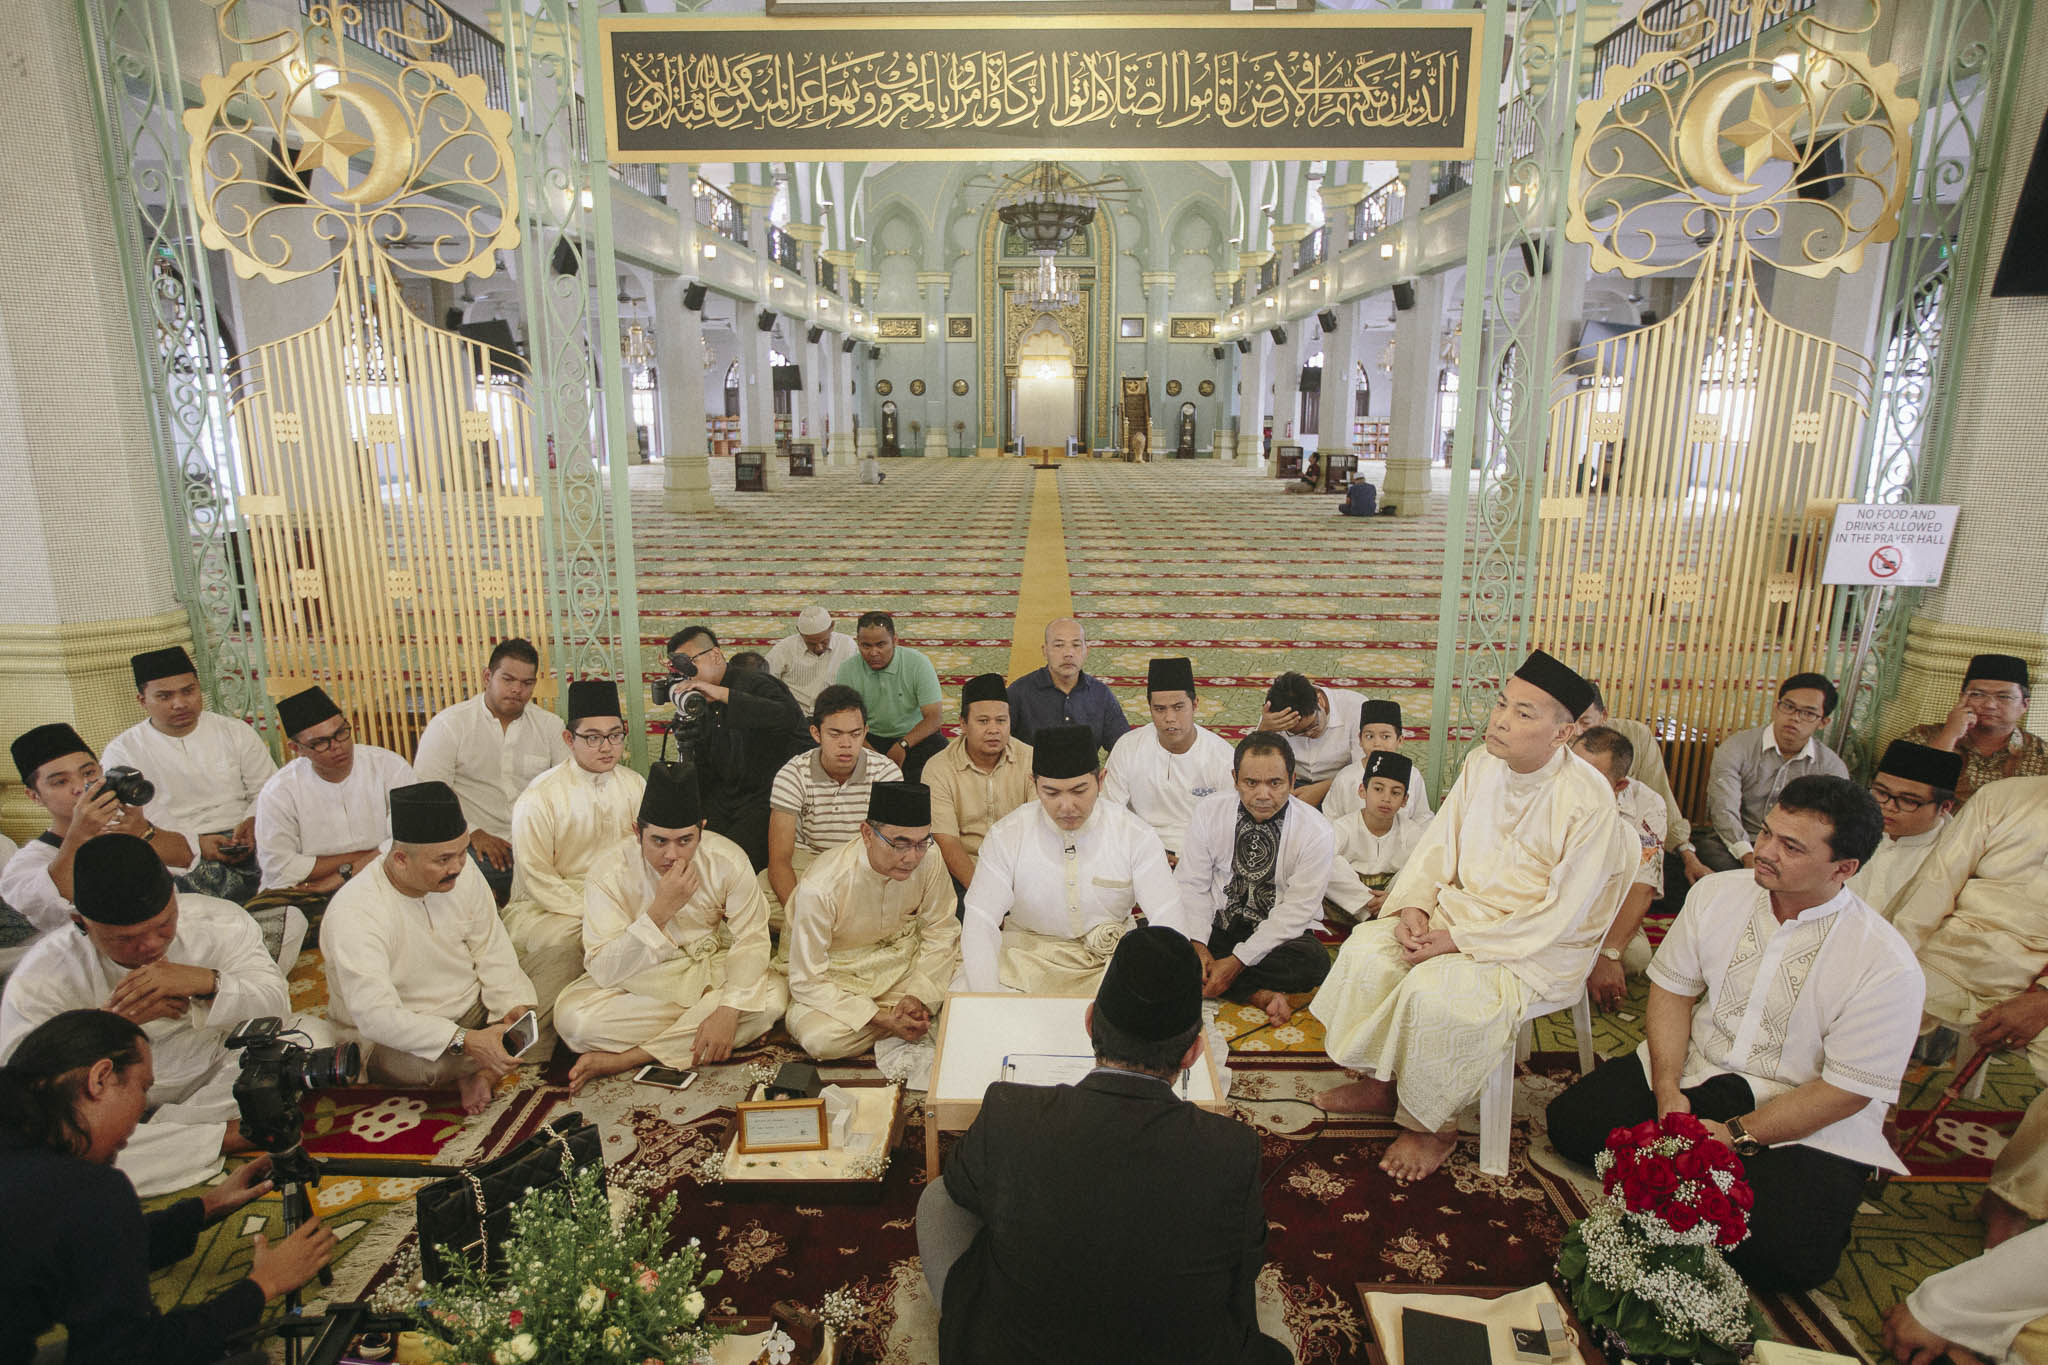 singapore-wedding-photographer-travel-khairul-atikah-15.jpg